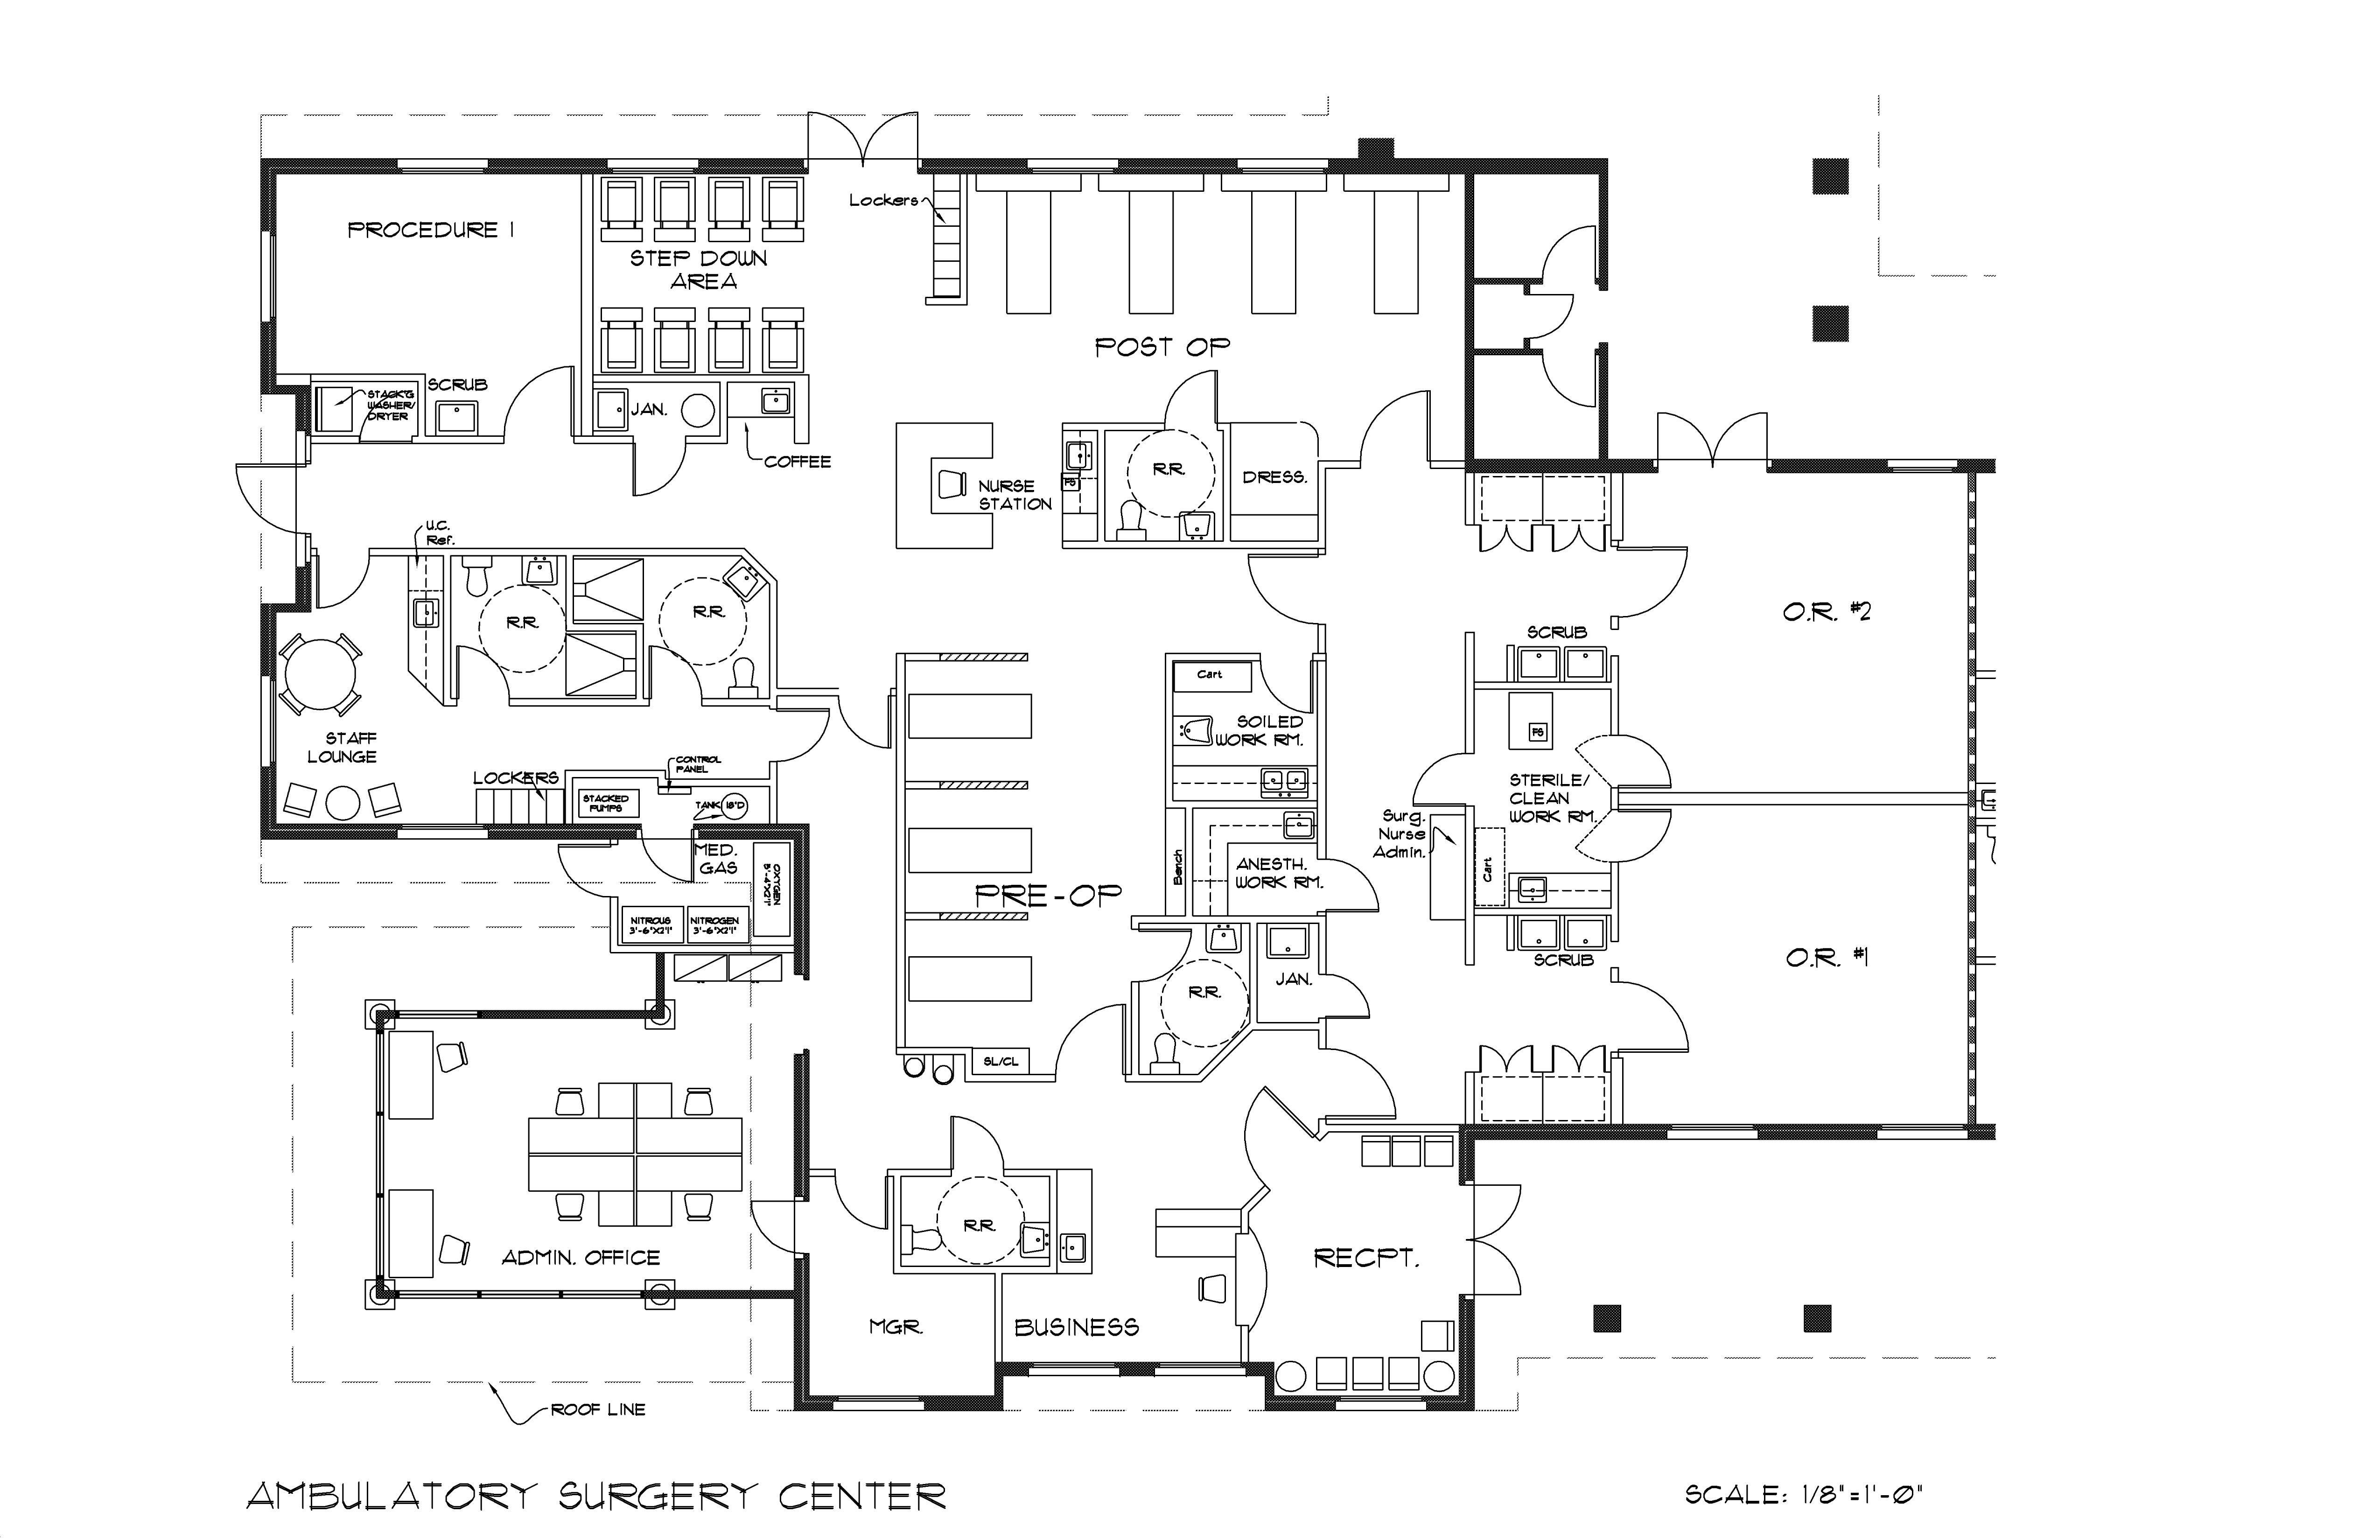 desert health center surgery center jpg 5100 215 3300 second floor plans trend home design and decor